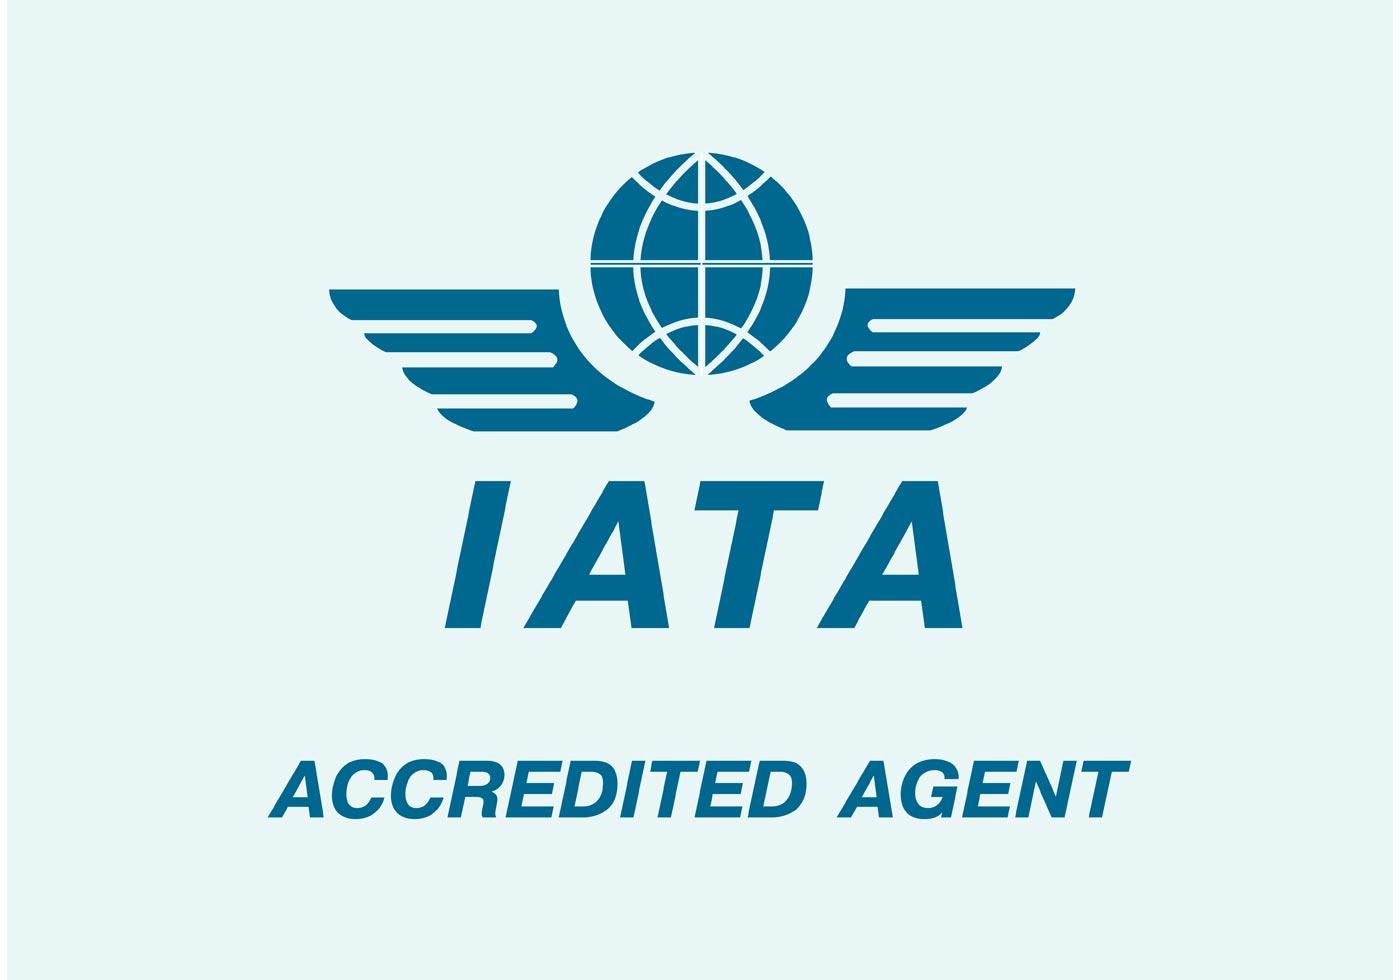 International Air Travel Association